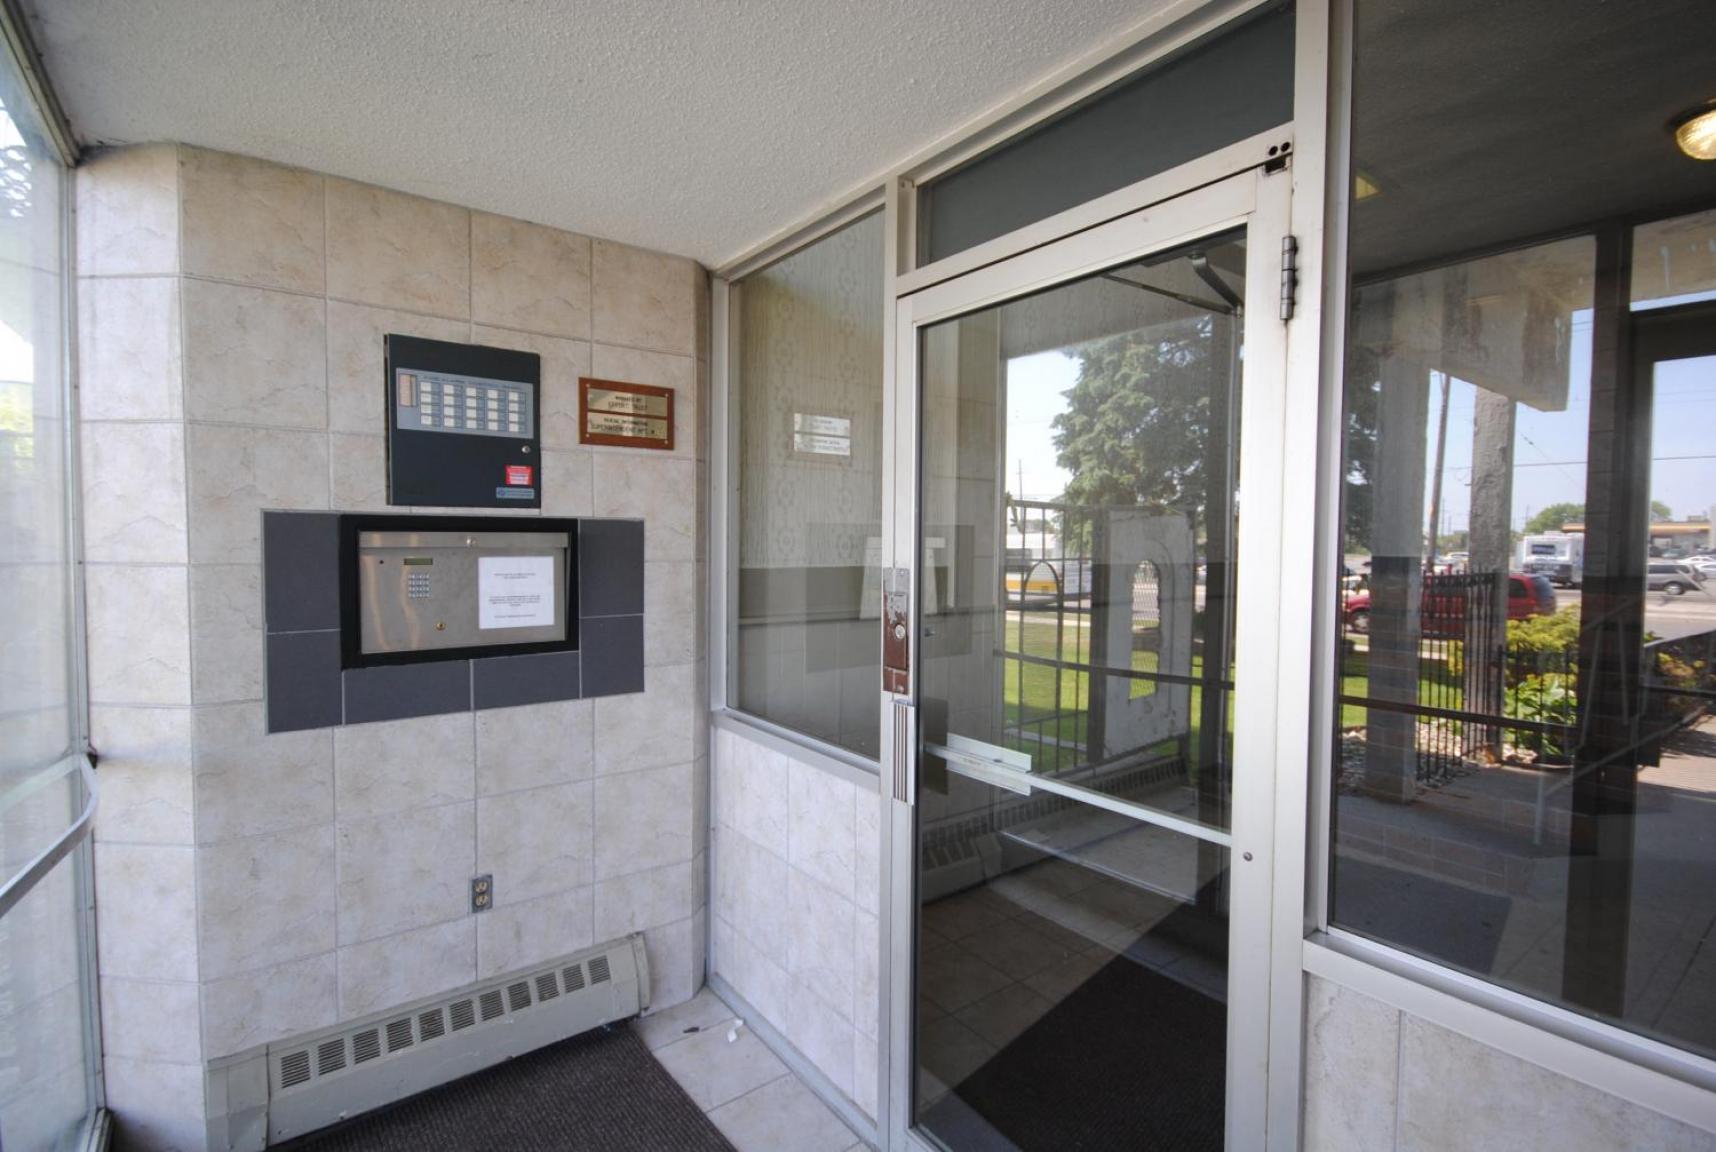 Hamilton apartments for rent hamilton rental listings page 1 - One bedroom apartment for rent hamilton ...